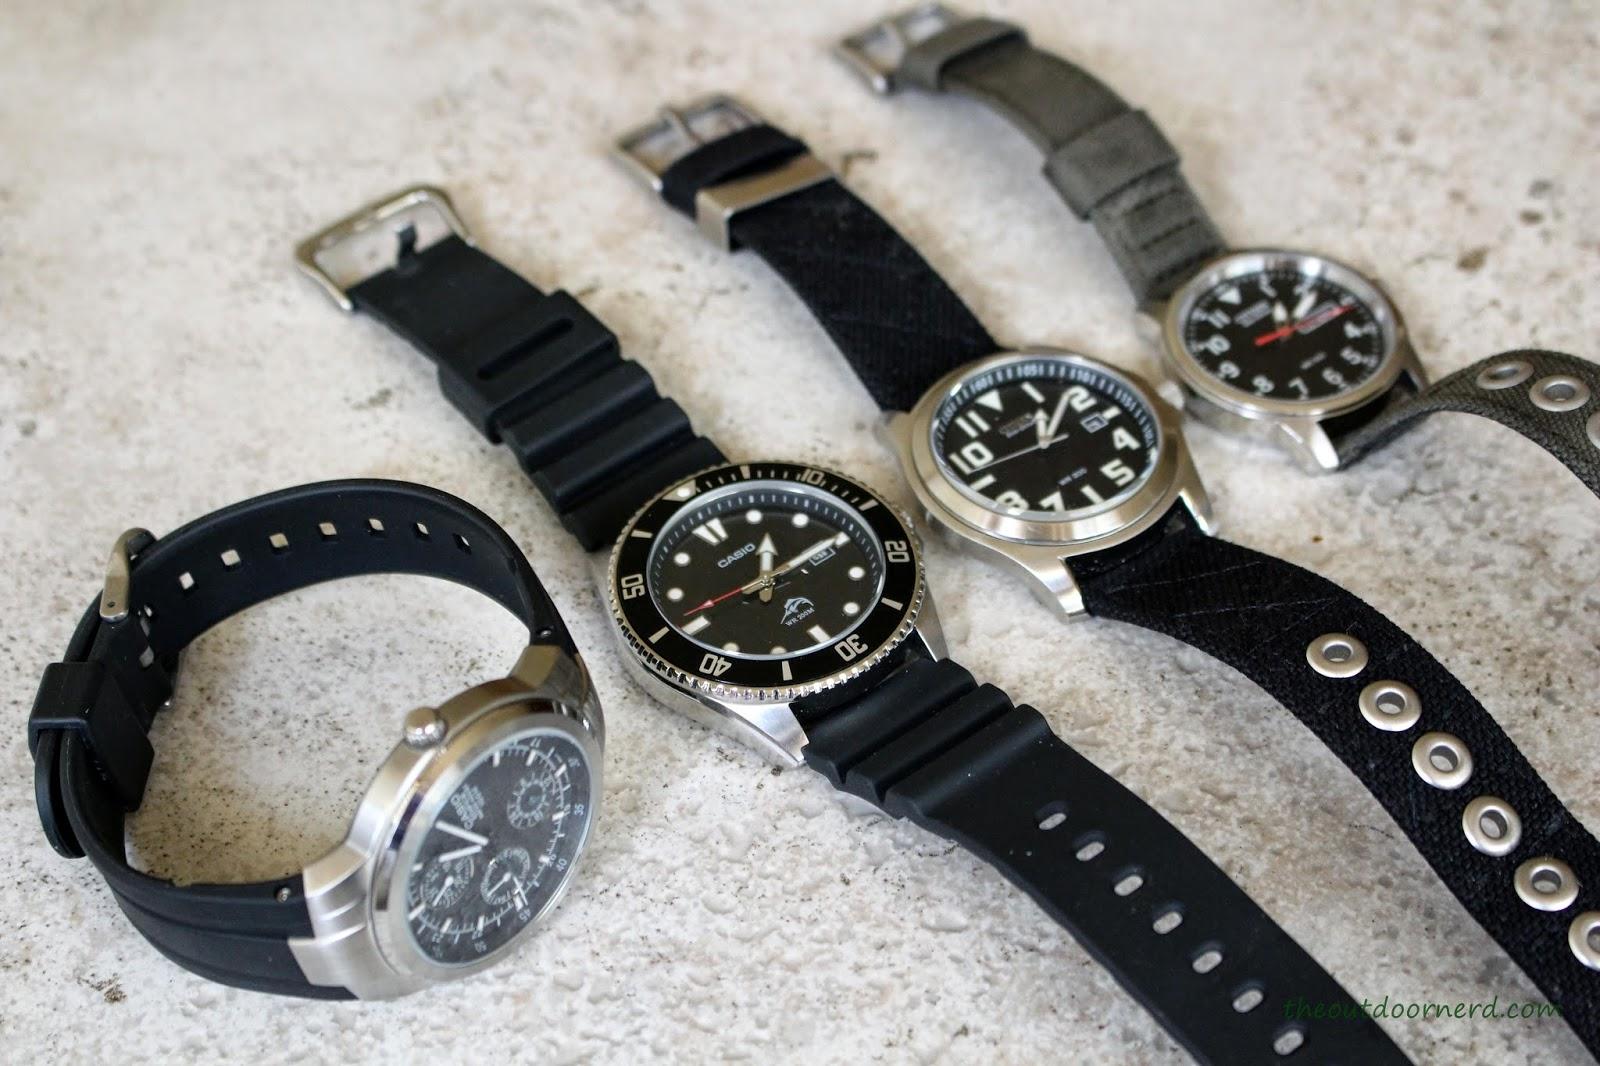 Casio Men's EF305-1AV Edifice Watch With Casio And Citizen Friends